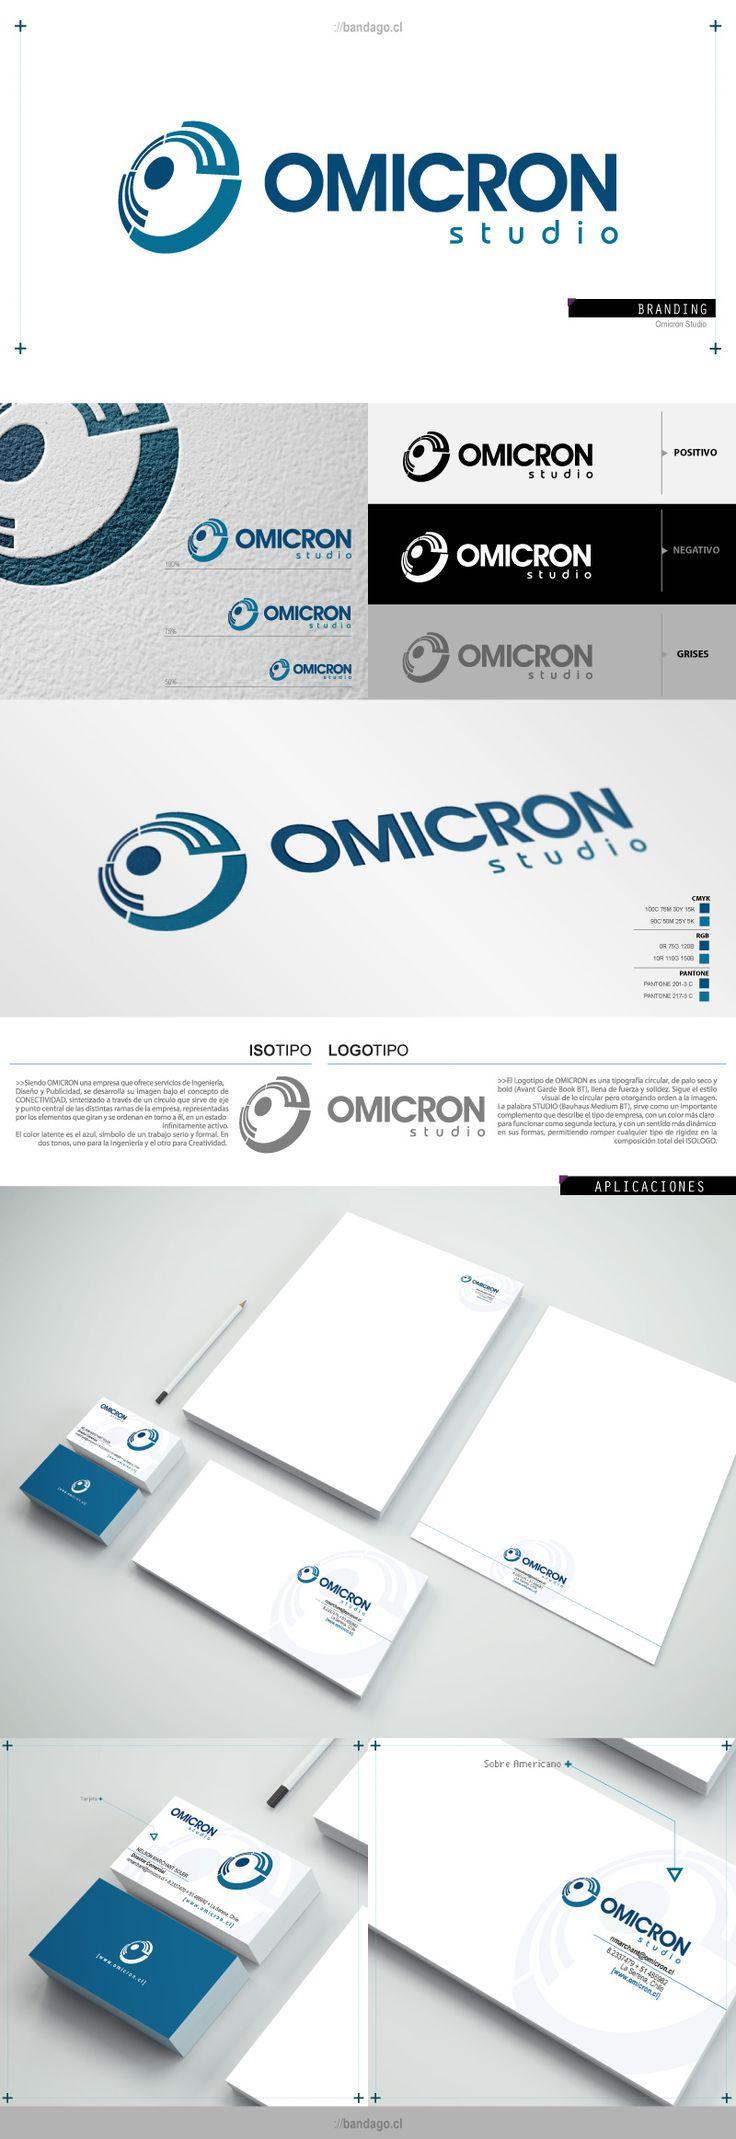 #diseño #crossmedia #branding #bio #logo #laserena #bandago http://bandago.cl/lens_portfolio/omicron/